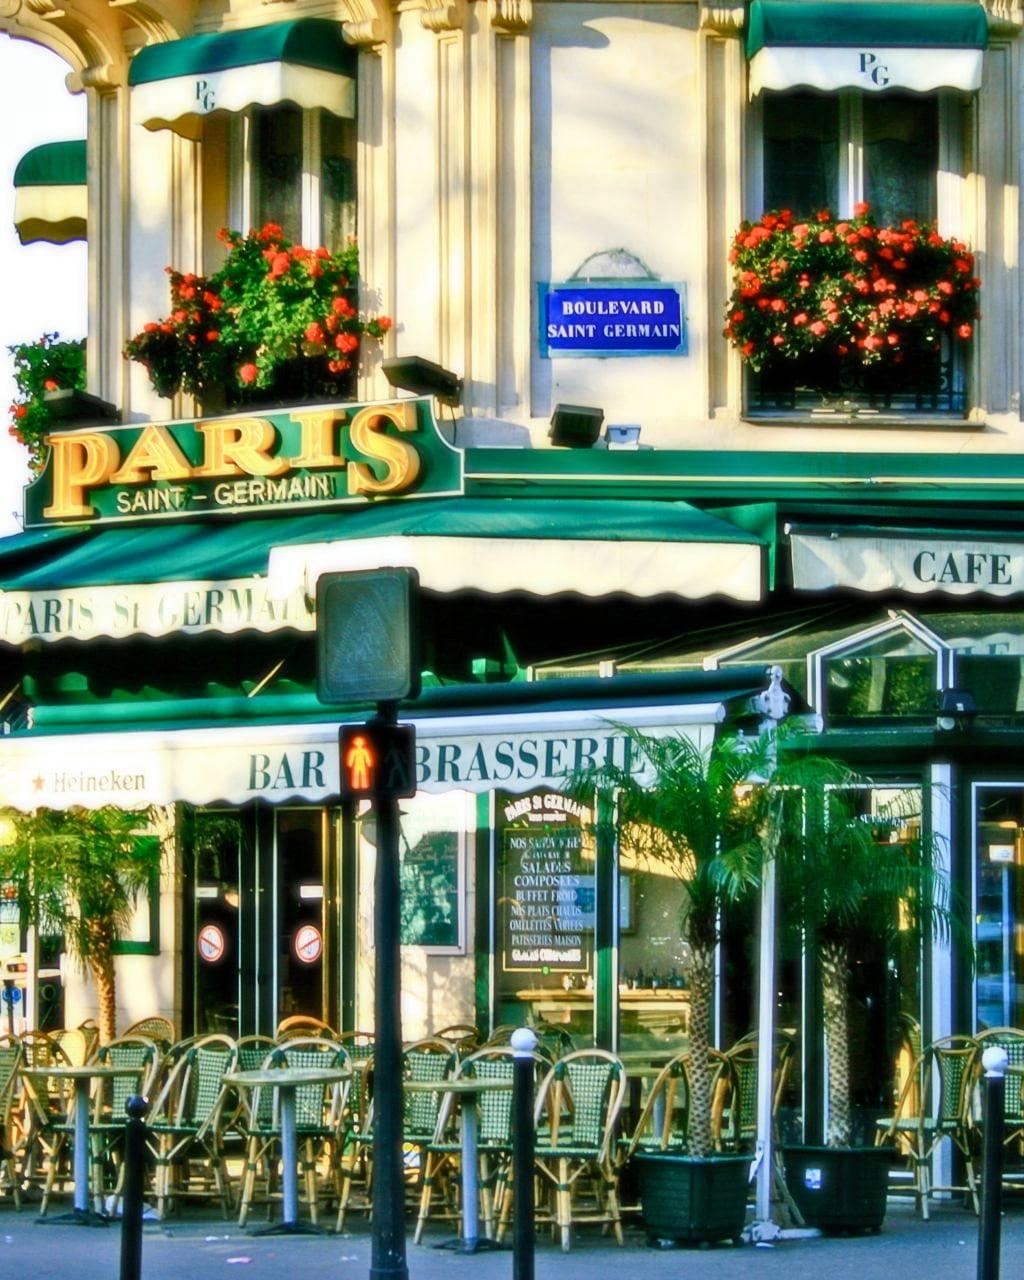 Paris photography french cafe saint